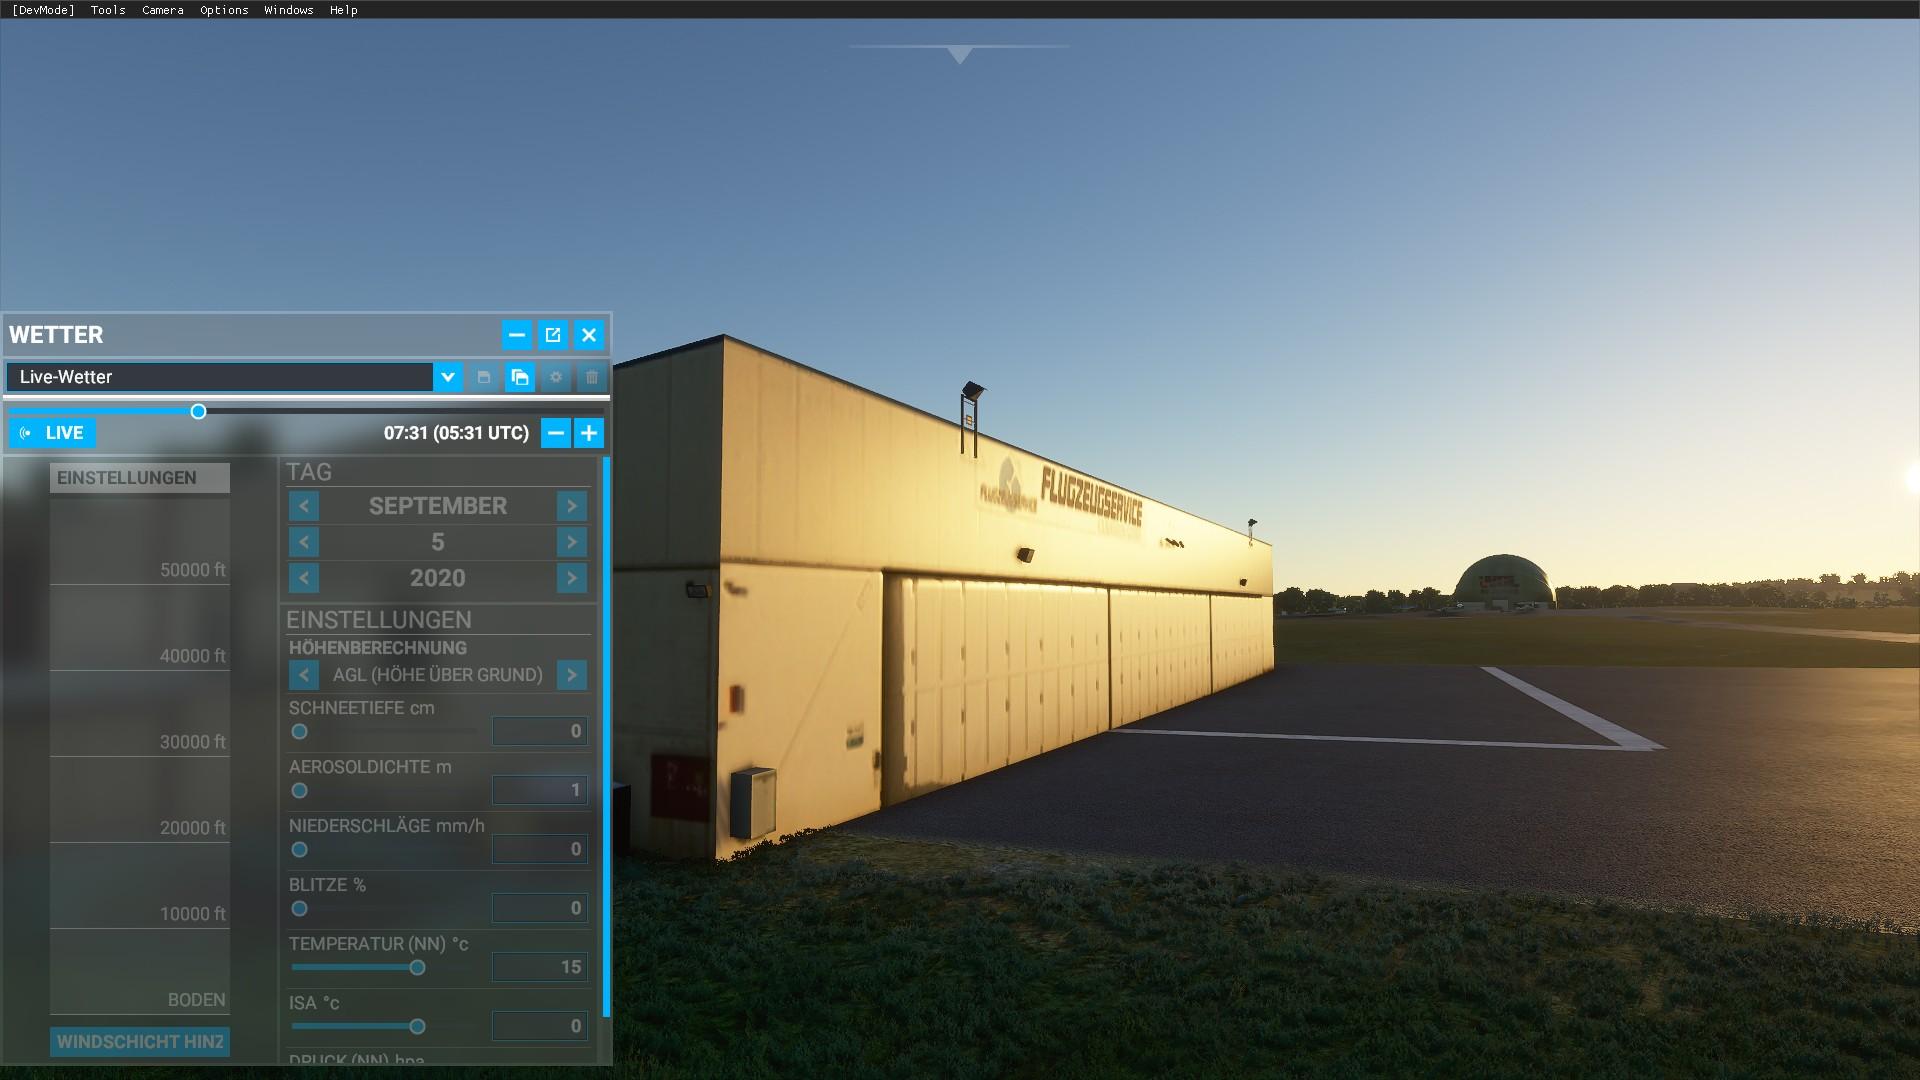 mfs_flughafen_edle_hangar_blimp_5.jpg